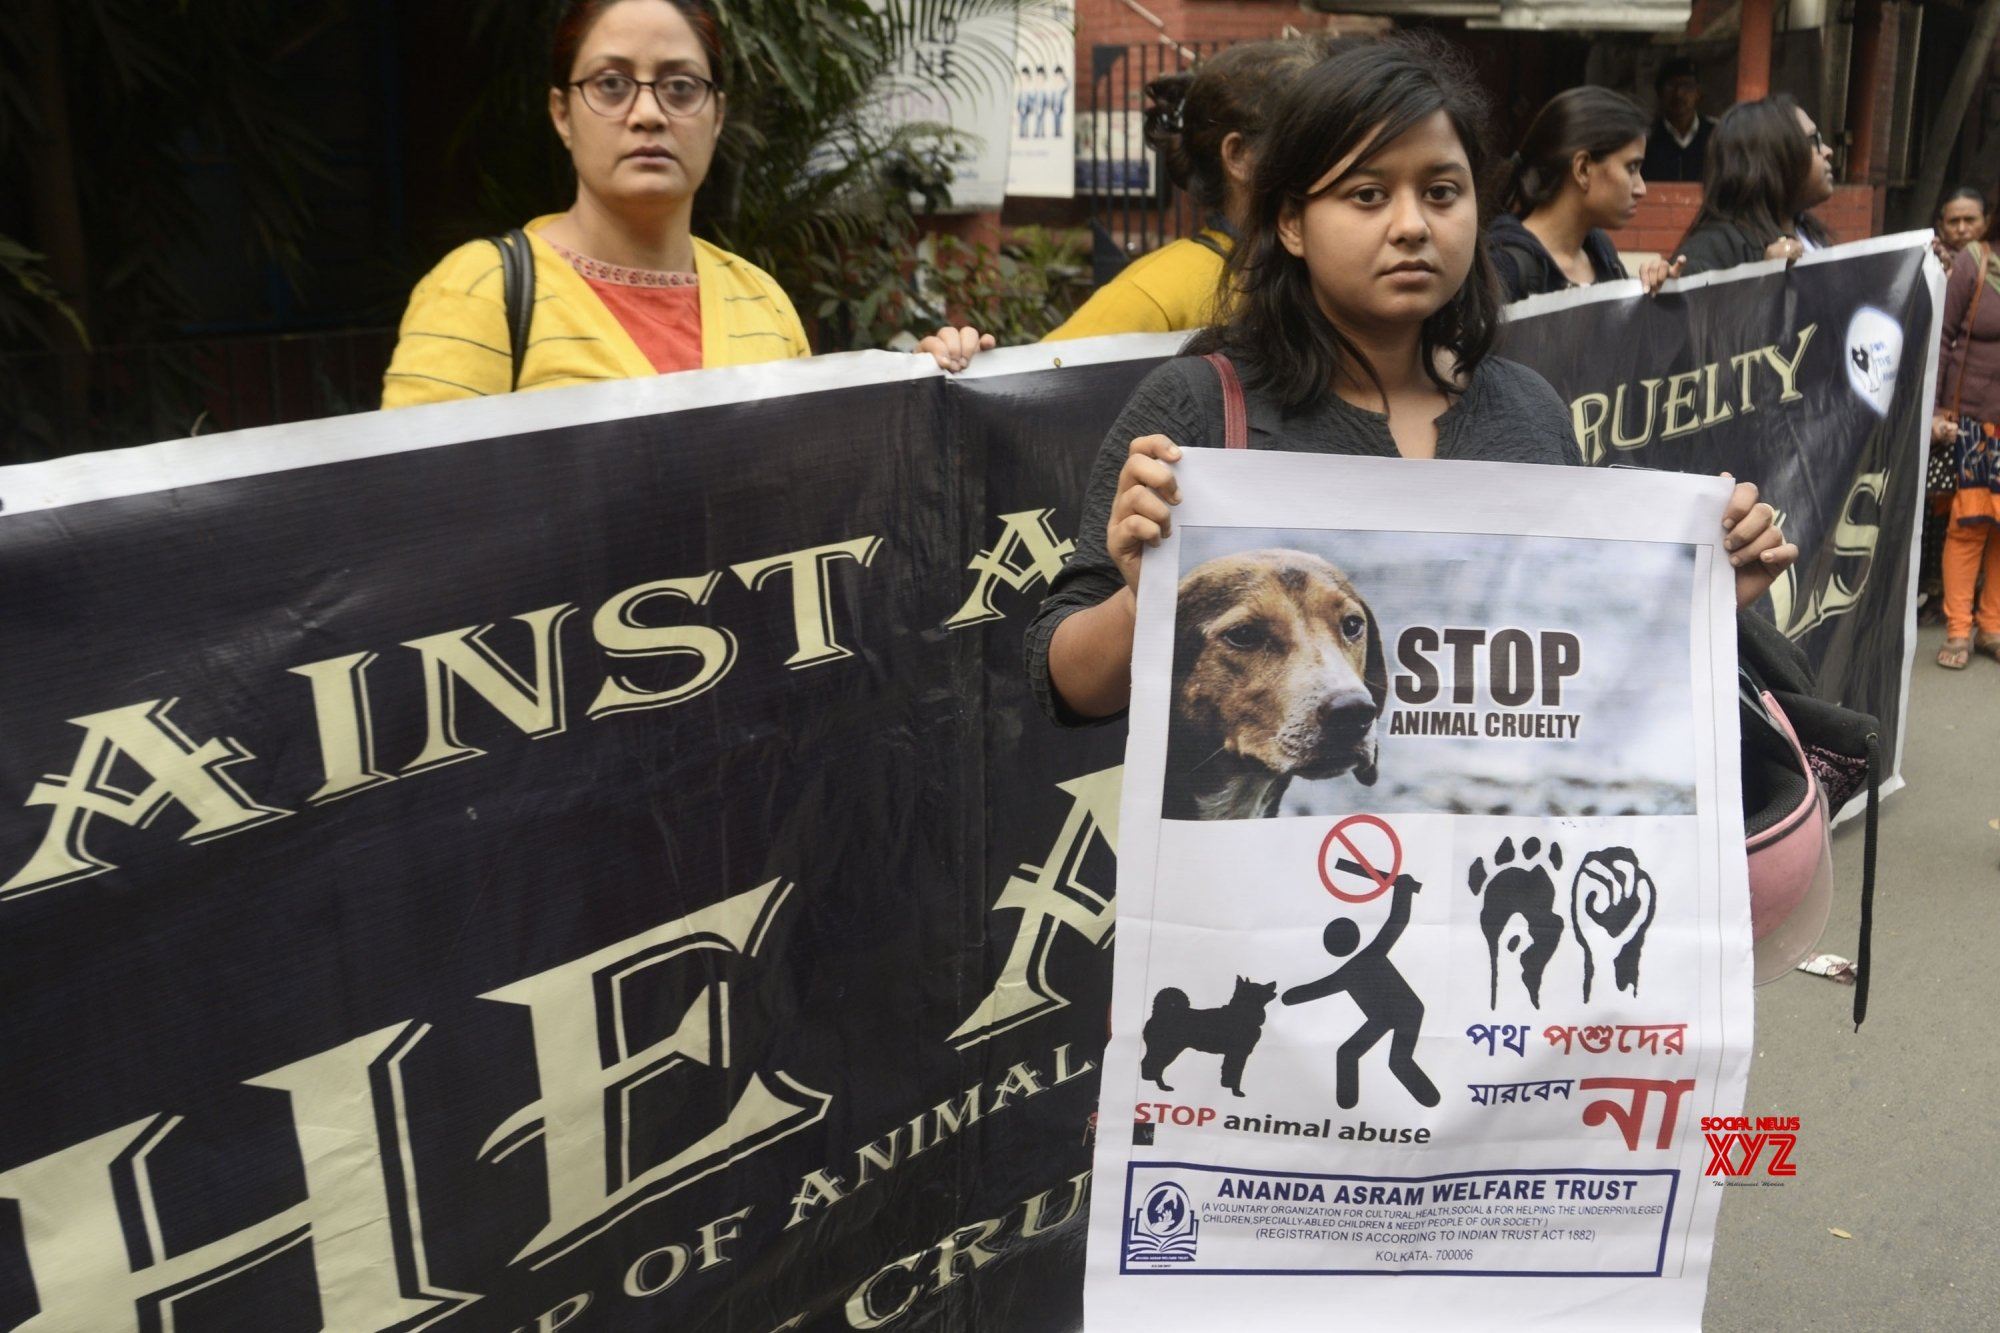 Kolkata: Bodies of 16 puppies found in Kolkata hospital #Gallery